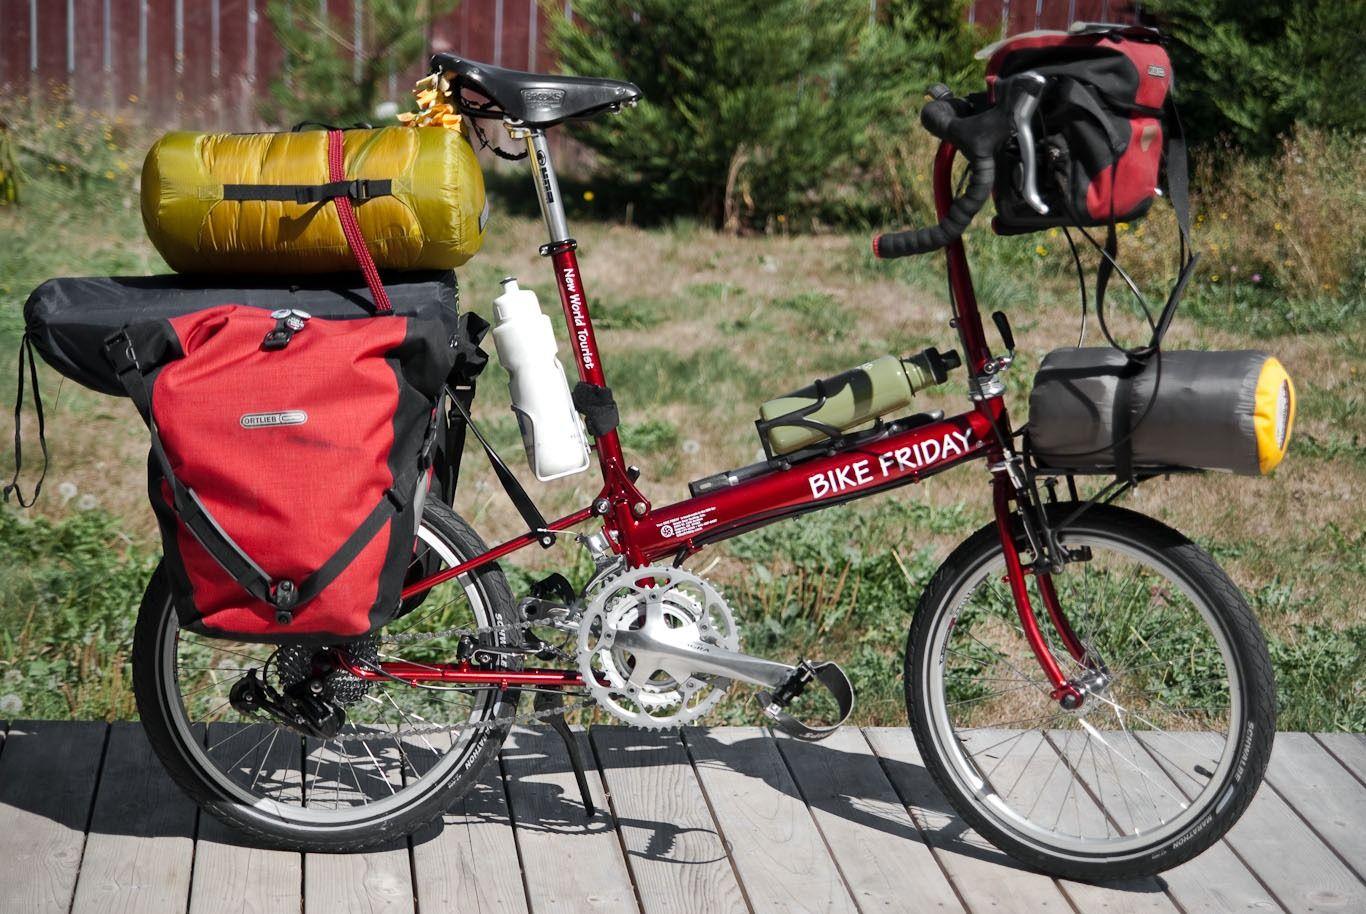 Bridgestone Picnica Folding Bike Folding Bicycle Pinterest